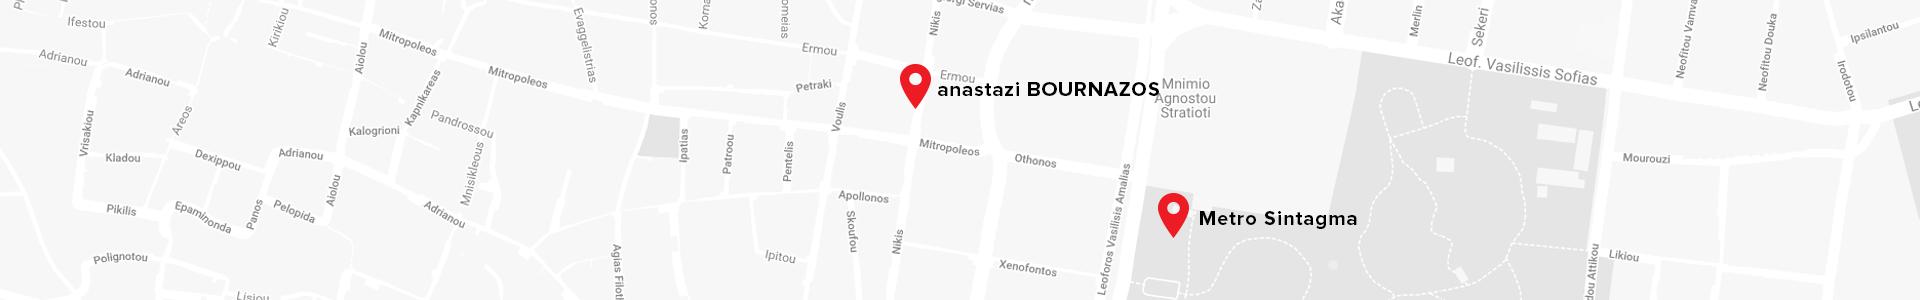 Bour 514 syntagma